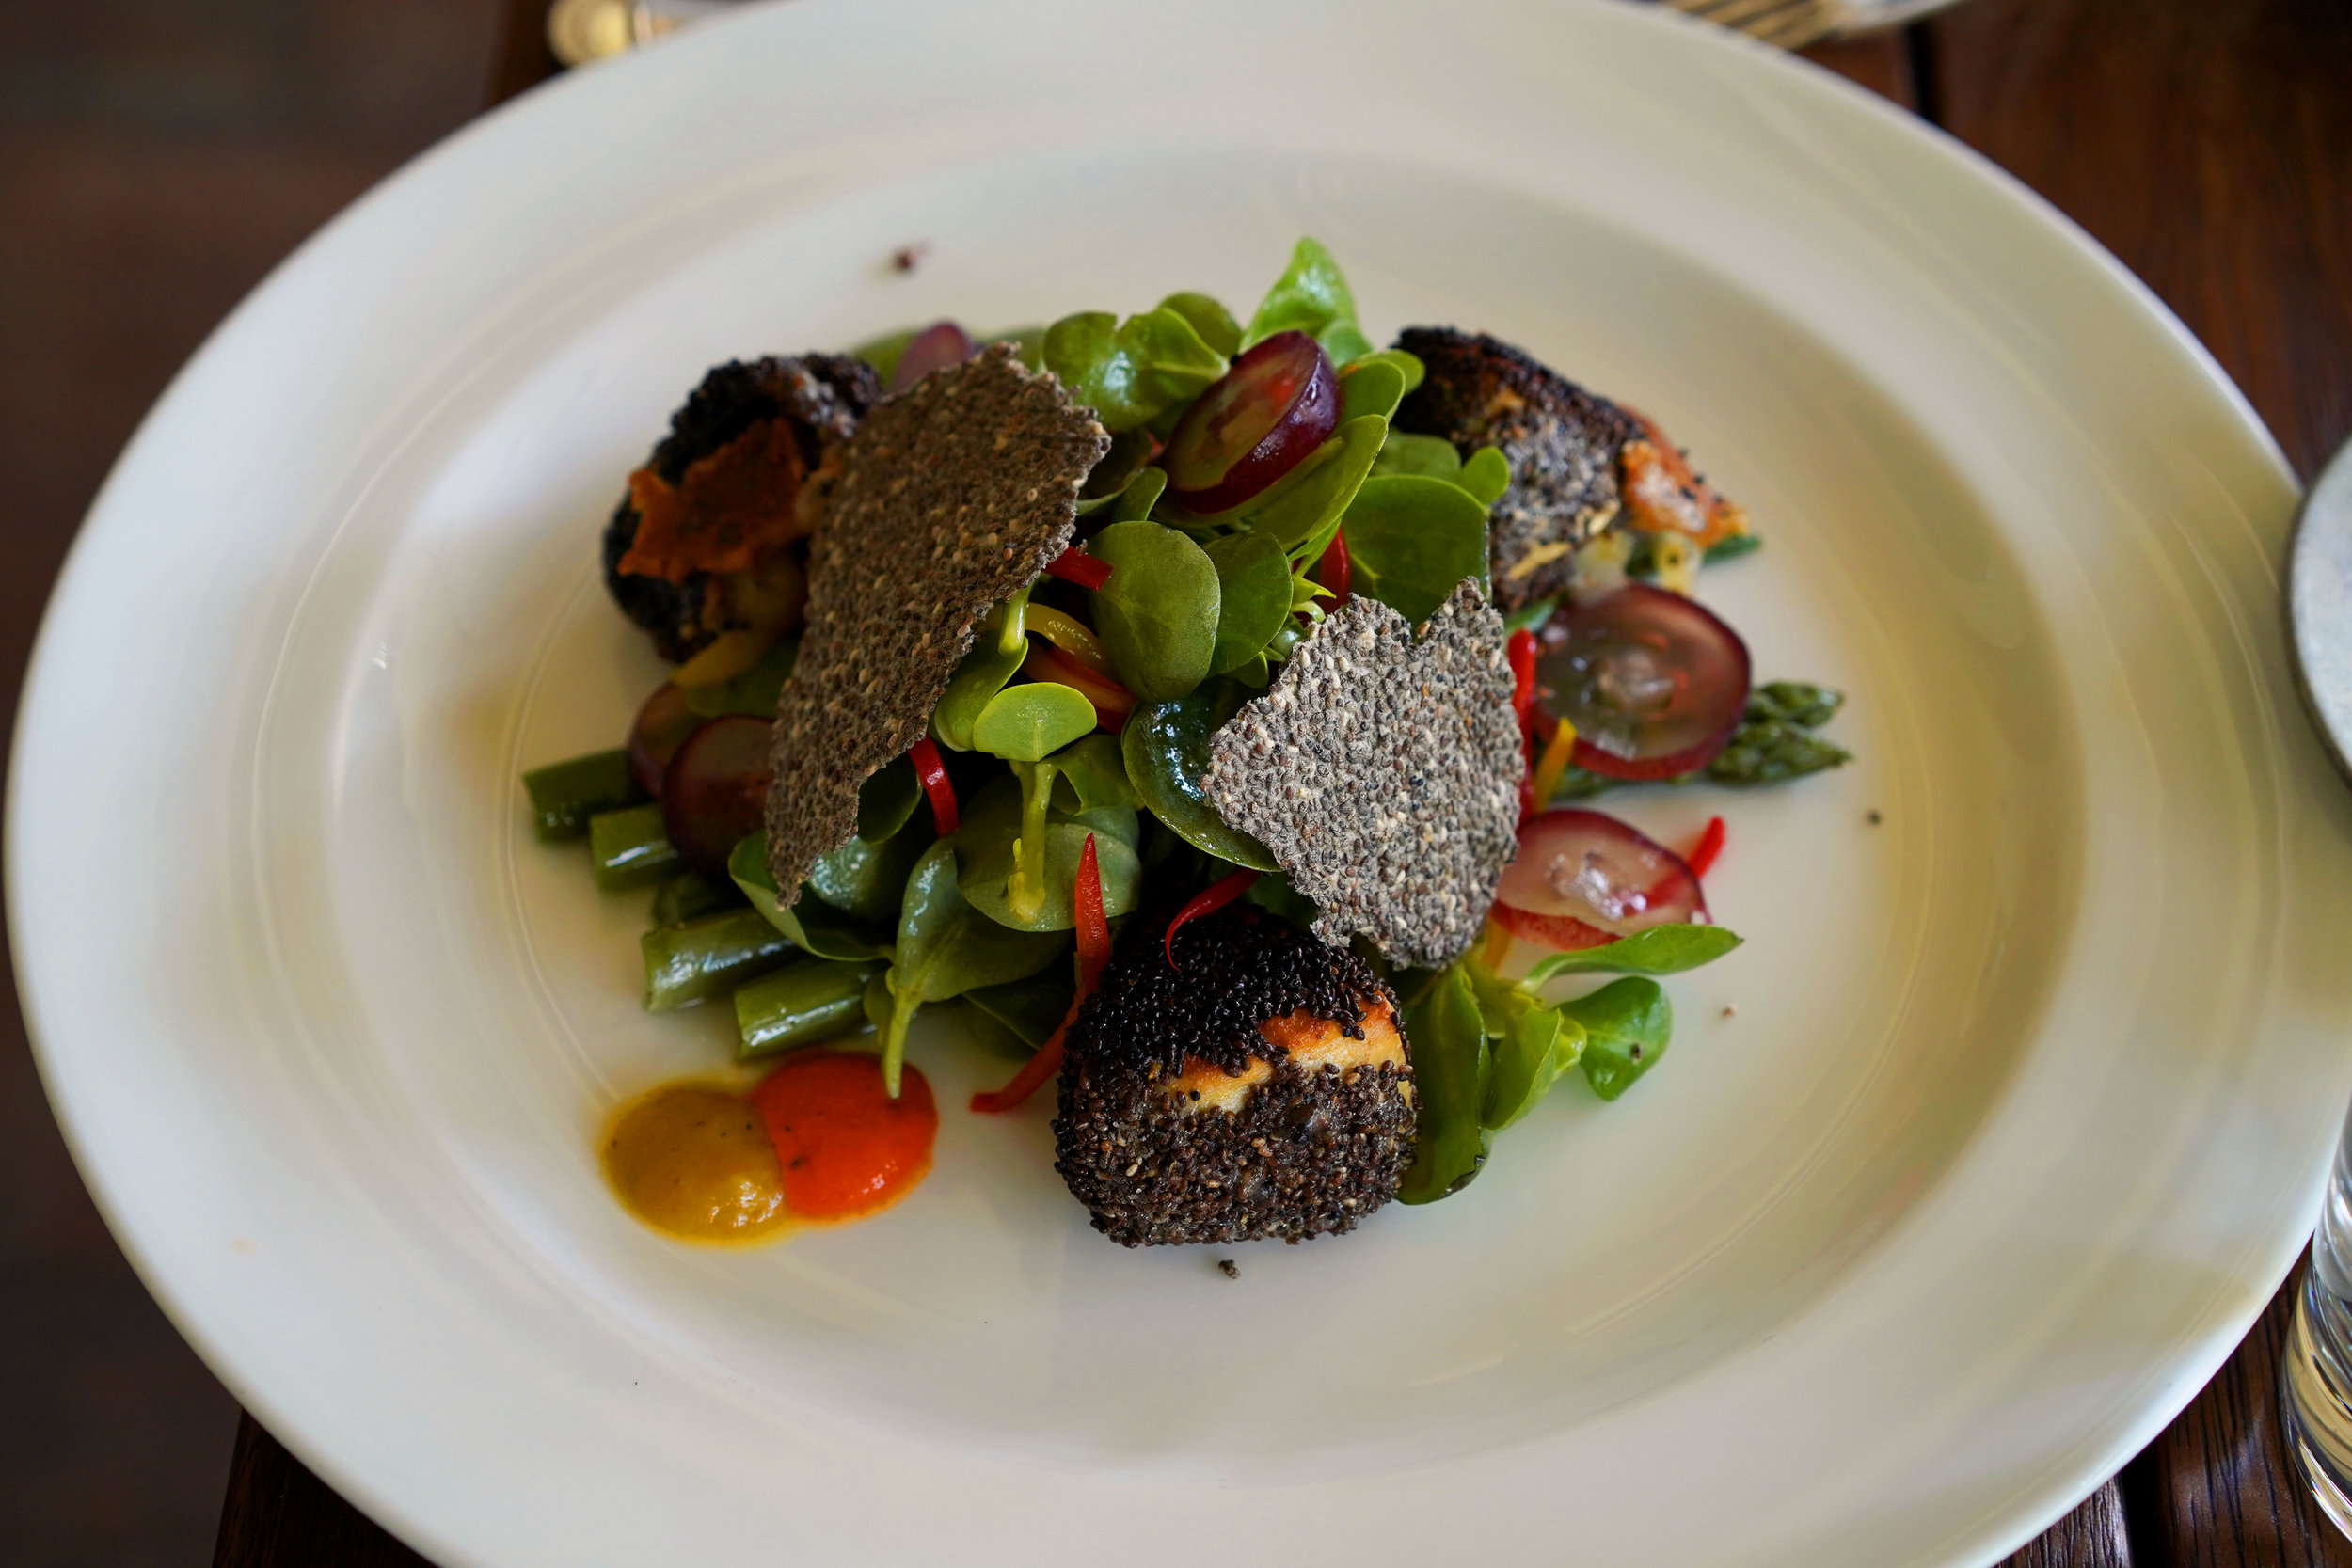 thetravelhub_istanbul_food7.JPG